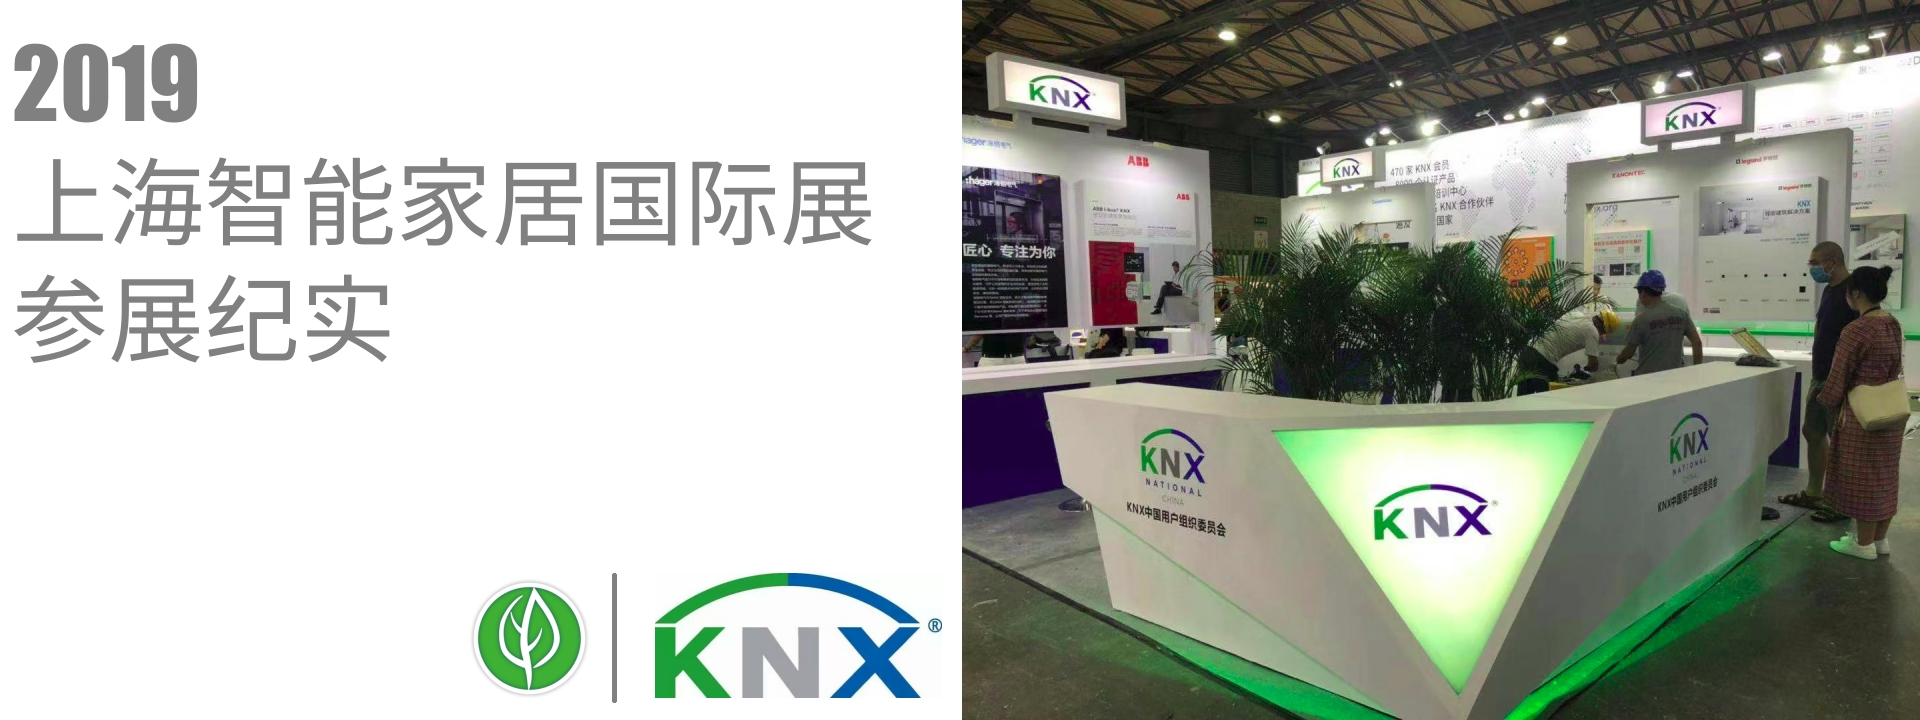 2019上海展